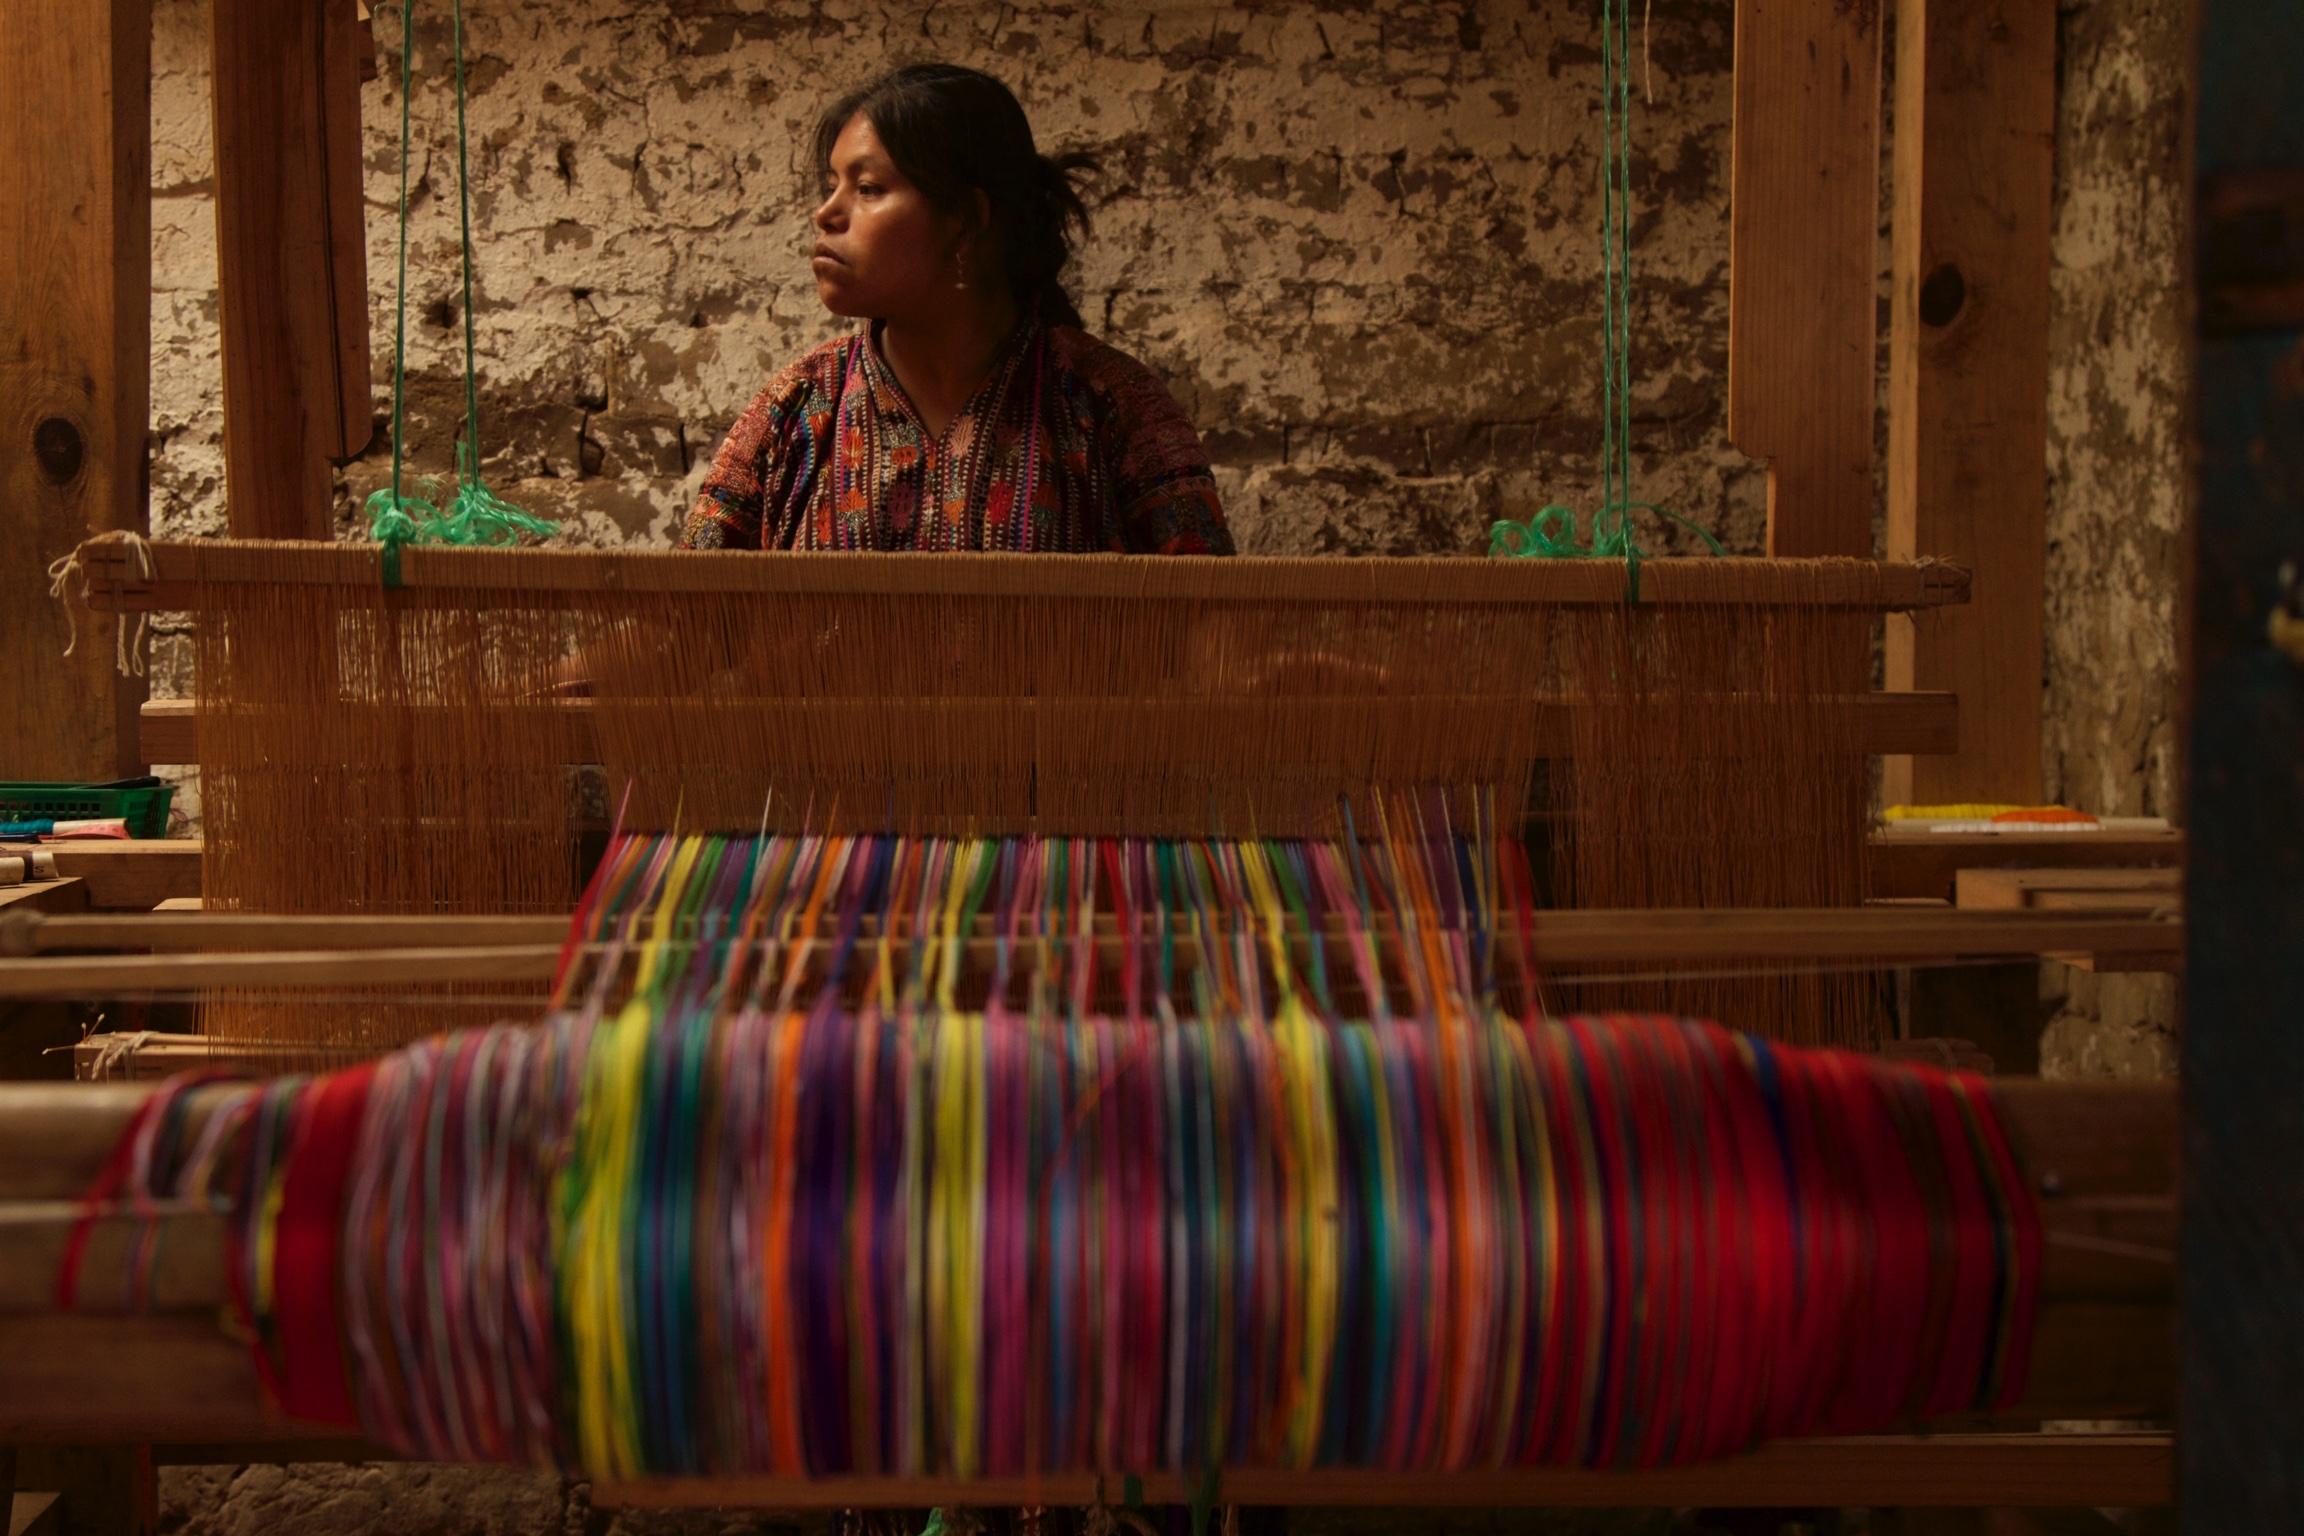 Guatemalan woman weaving colorful textiles